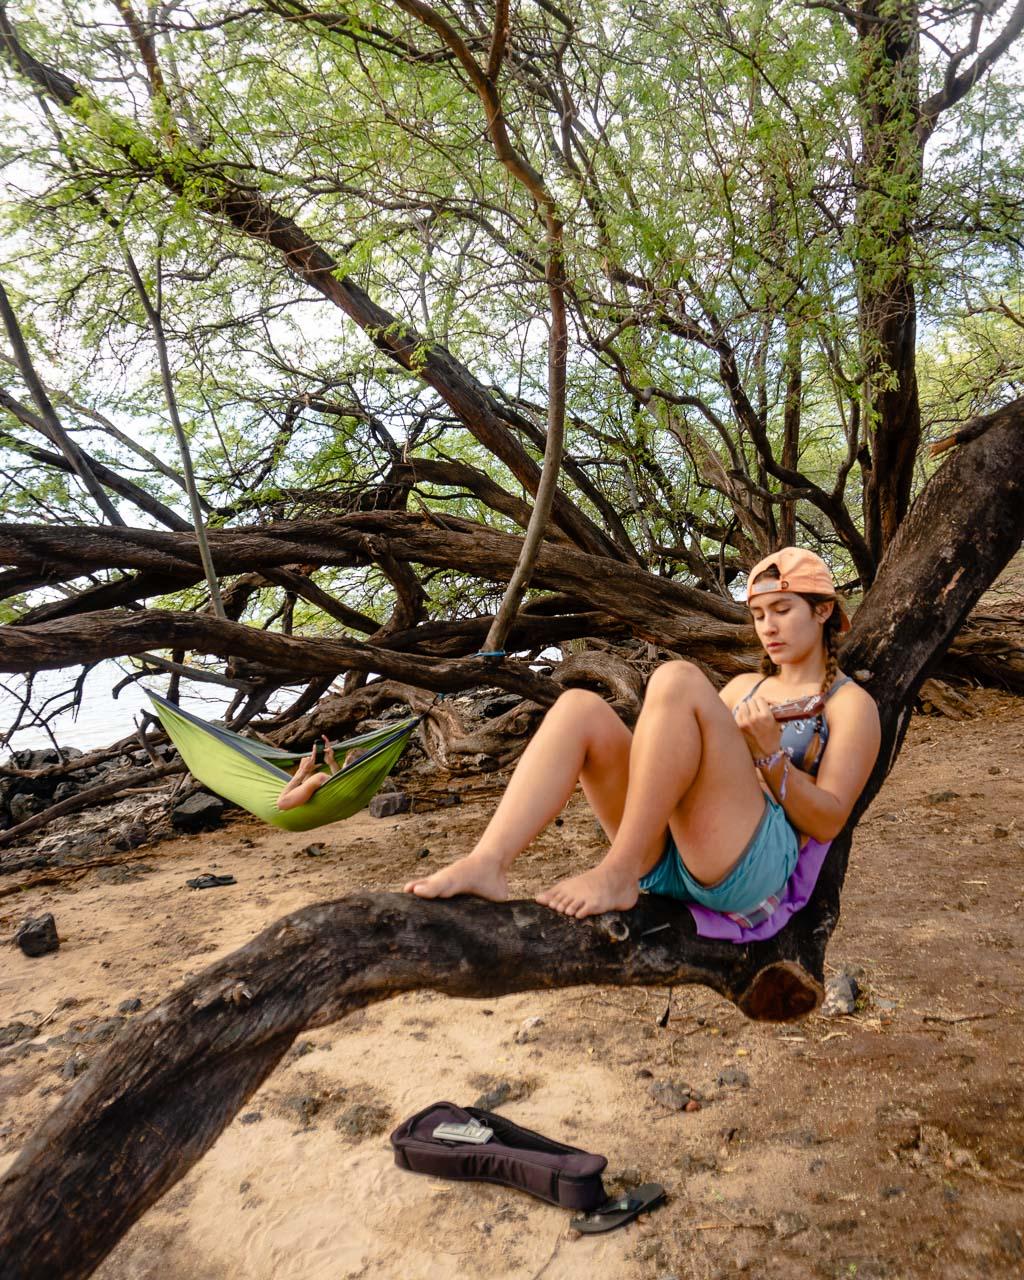 Spencer Beach Camping, Big Island, Hawaii